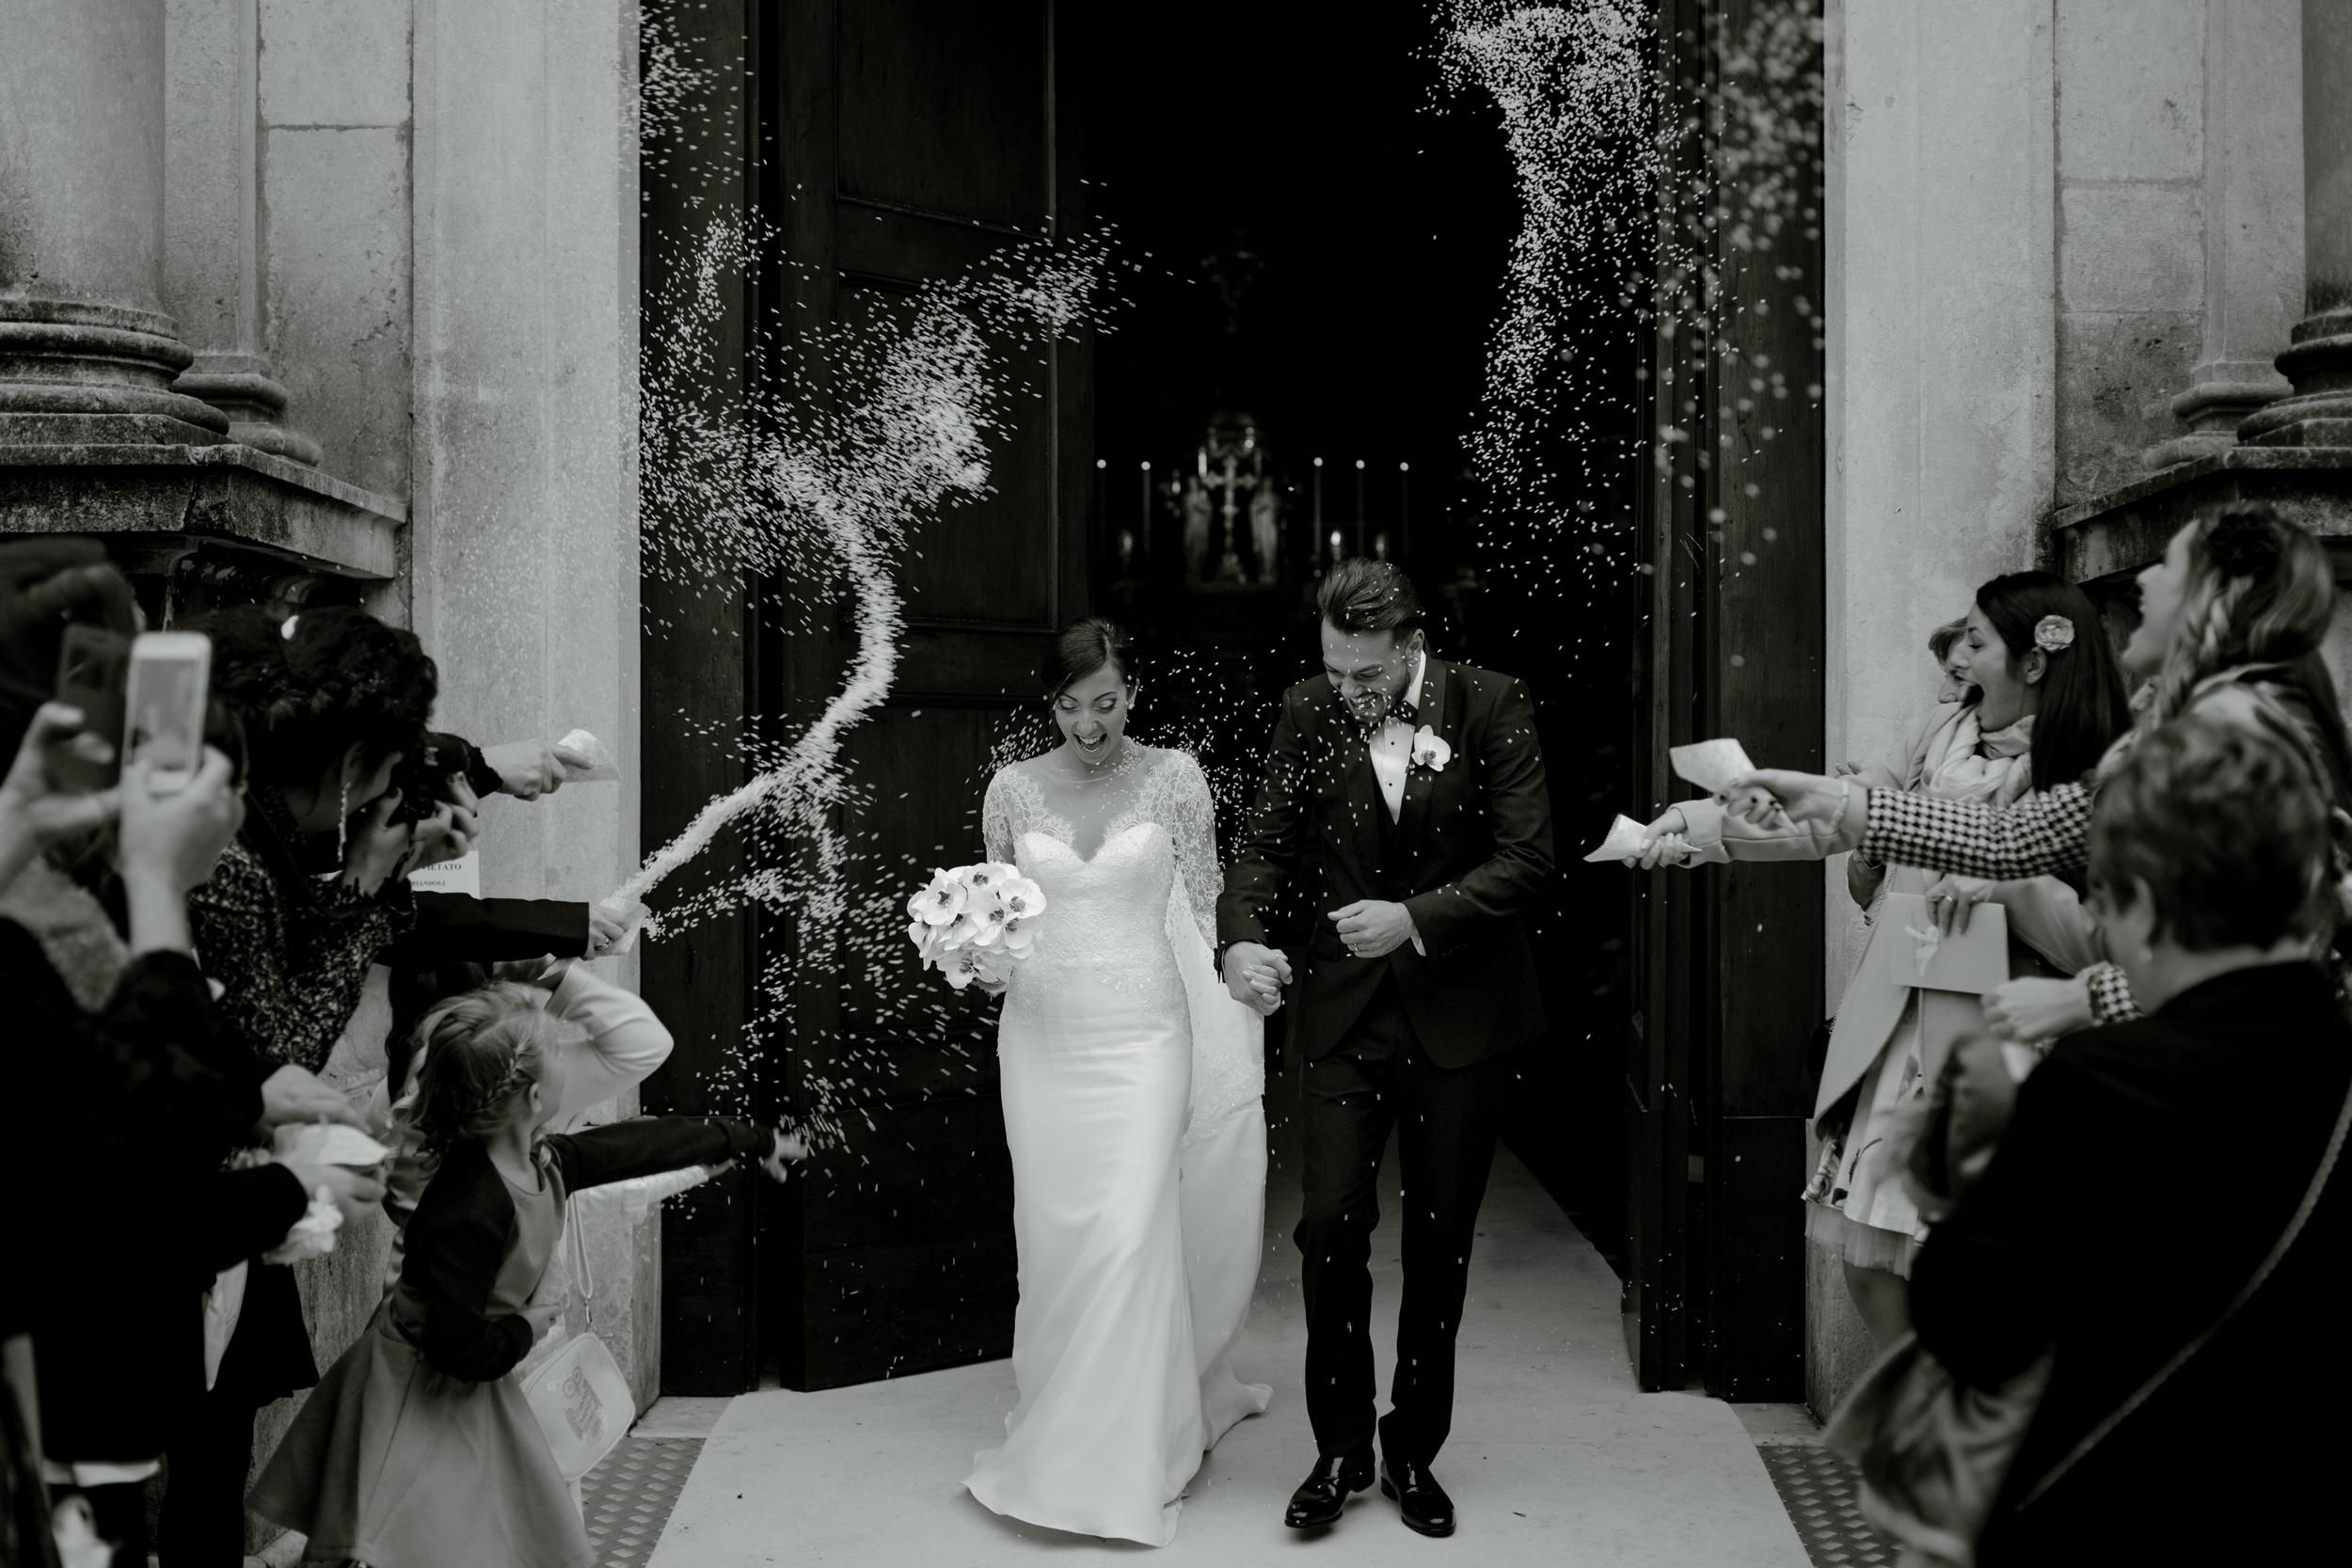 confetti-toss-outside-church.jpg